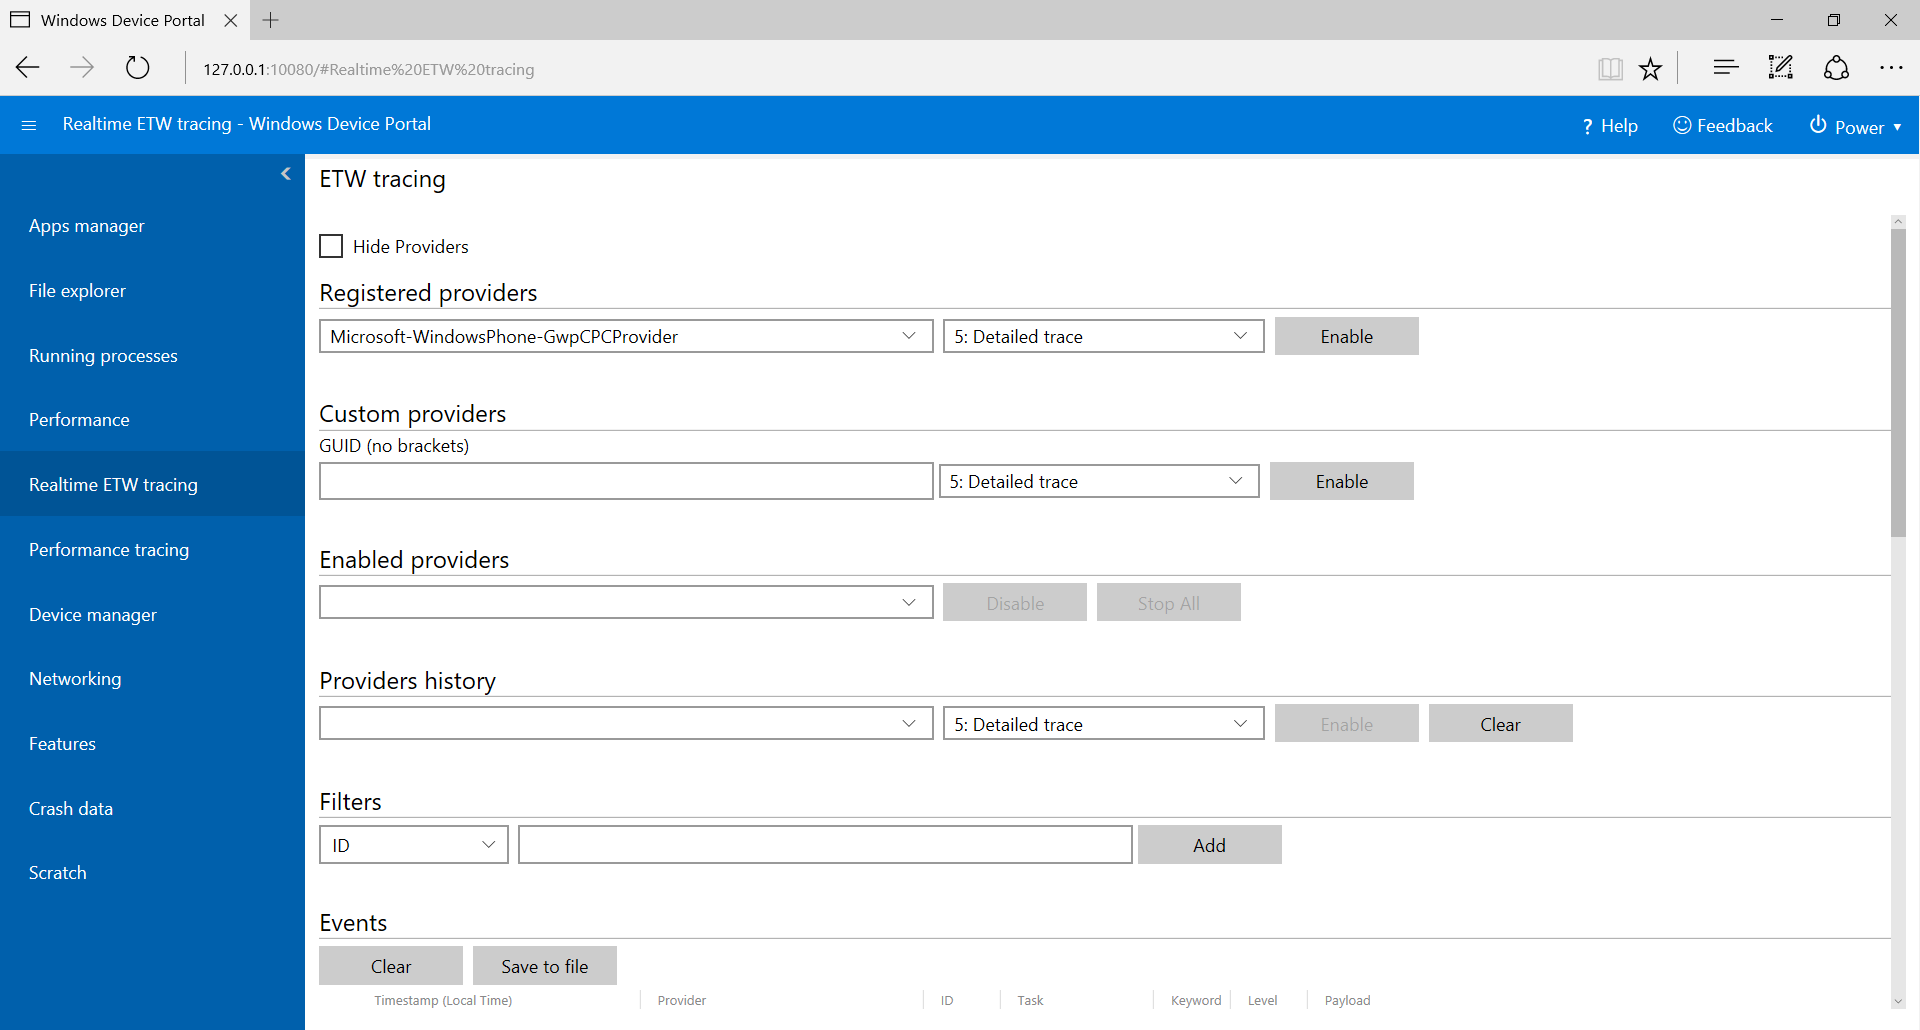 microsoft directx 11.1 download windows 7